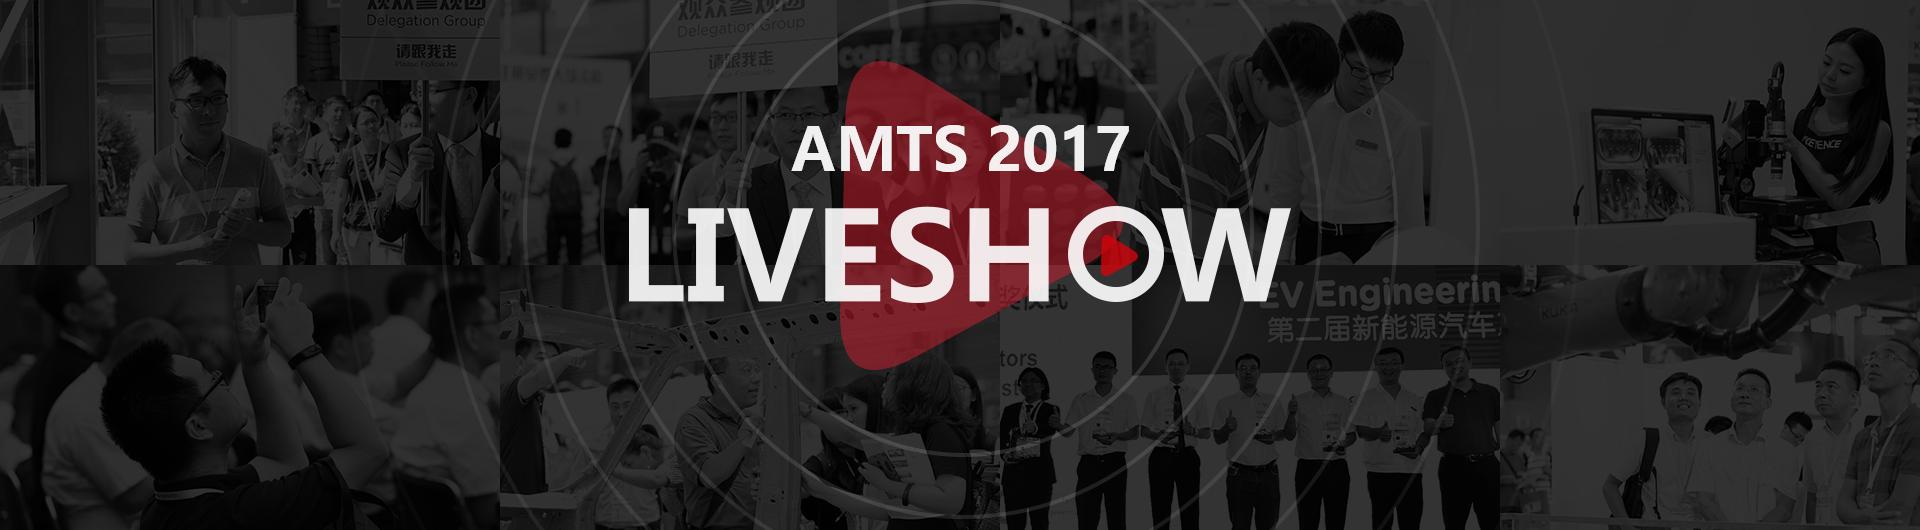 2017 AMTS live show